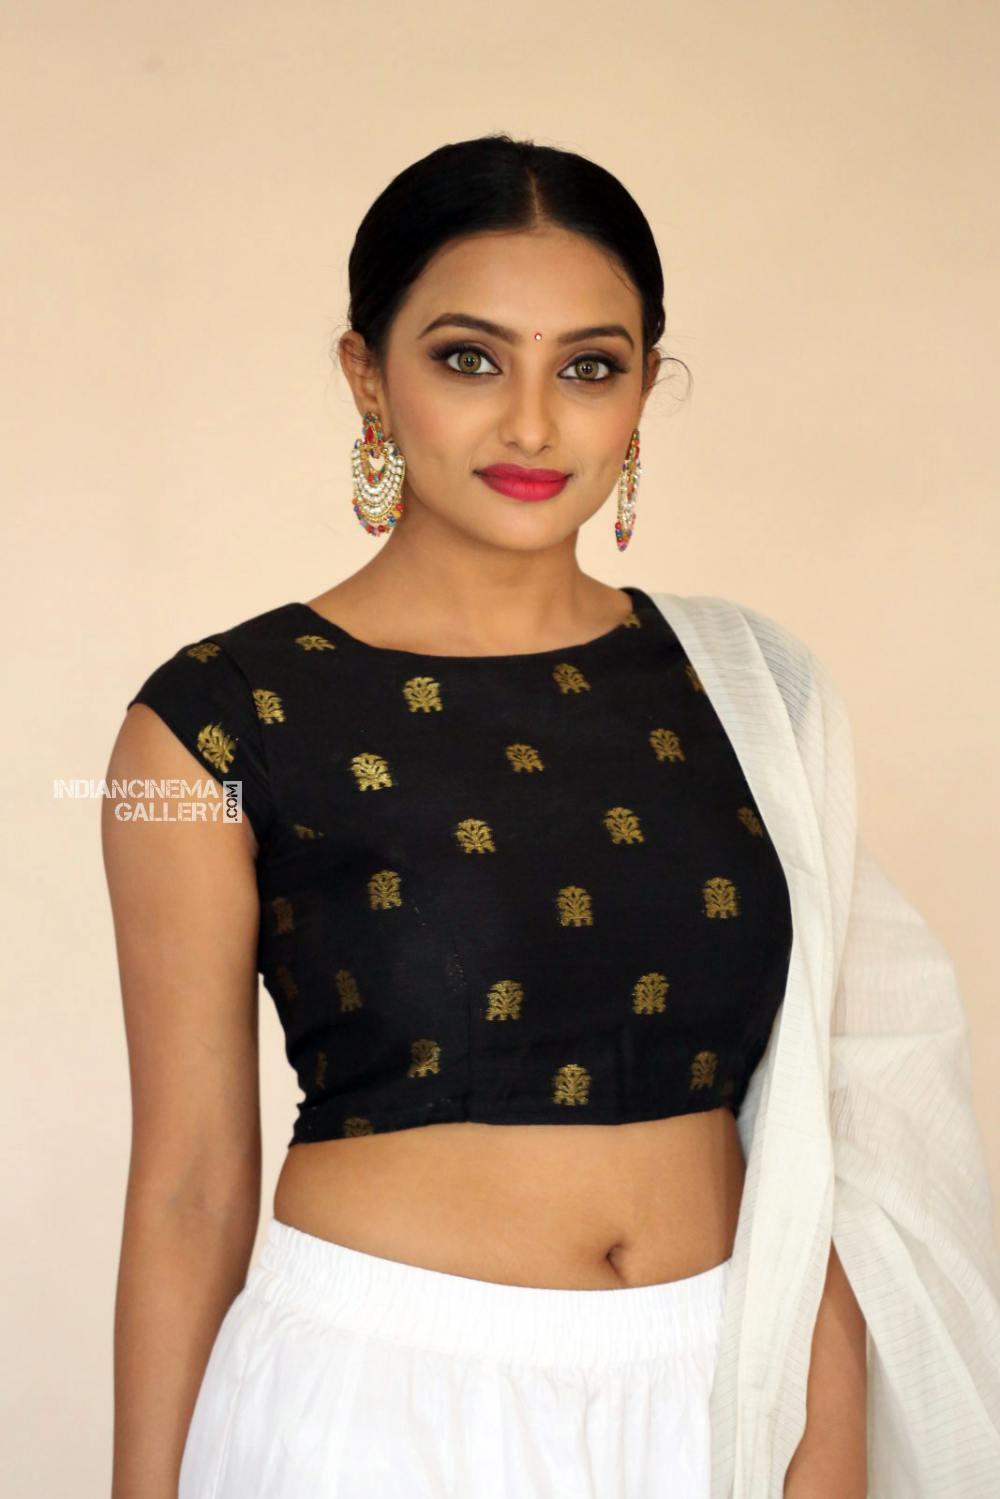 Actress Tuya Chakraborty Stills (6)